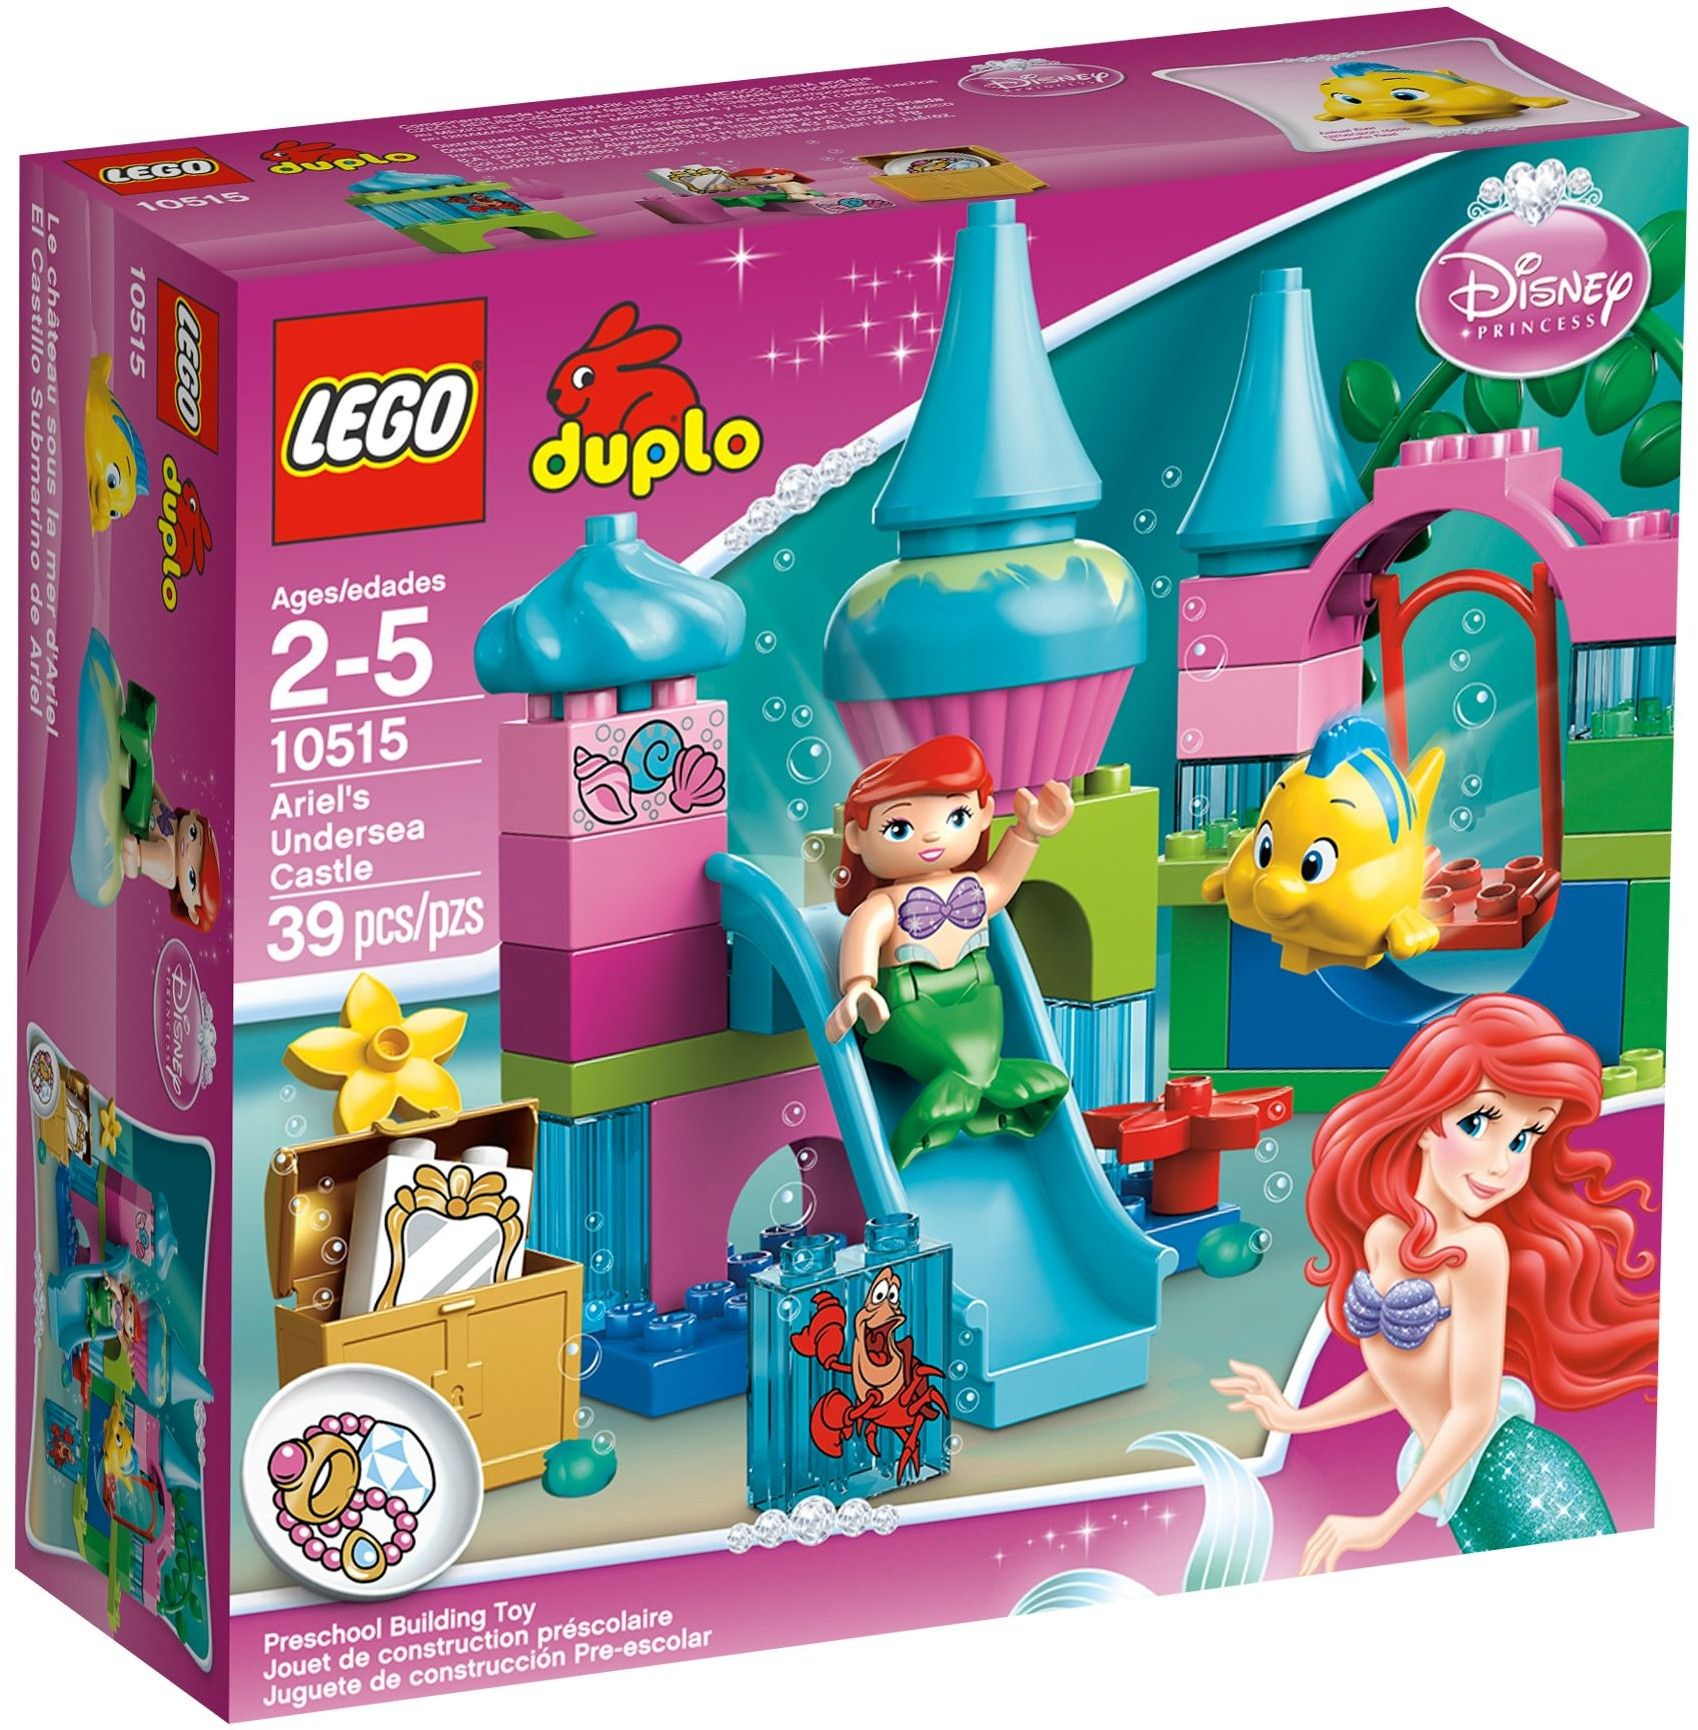 105151 Ariel's Undersea Castle Lego duplo